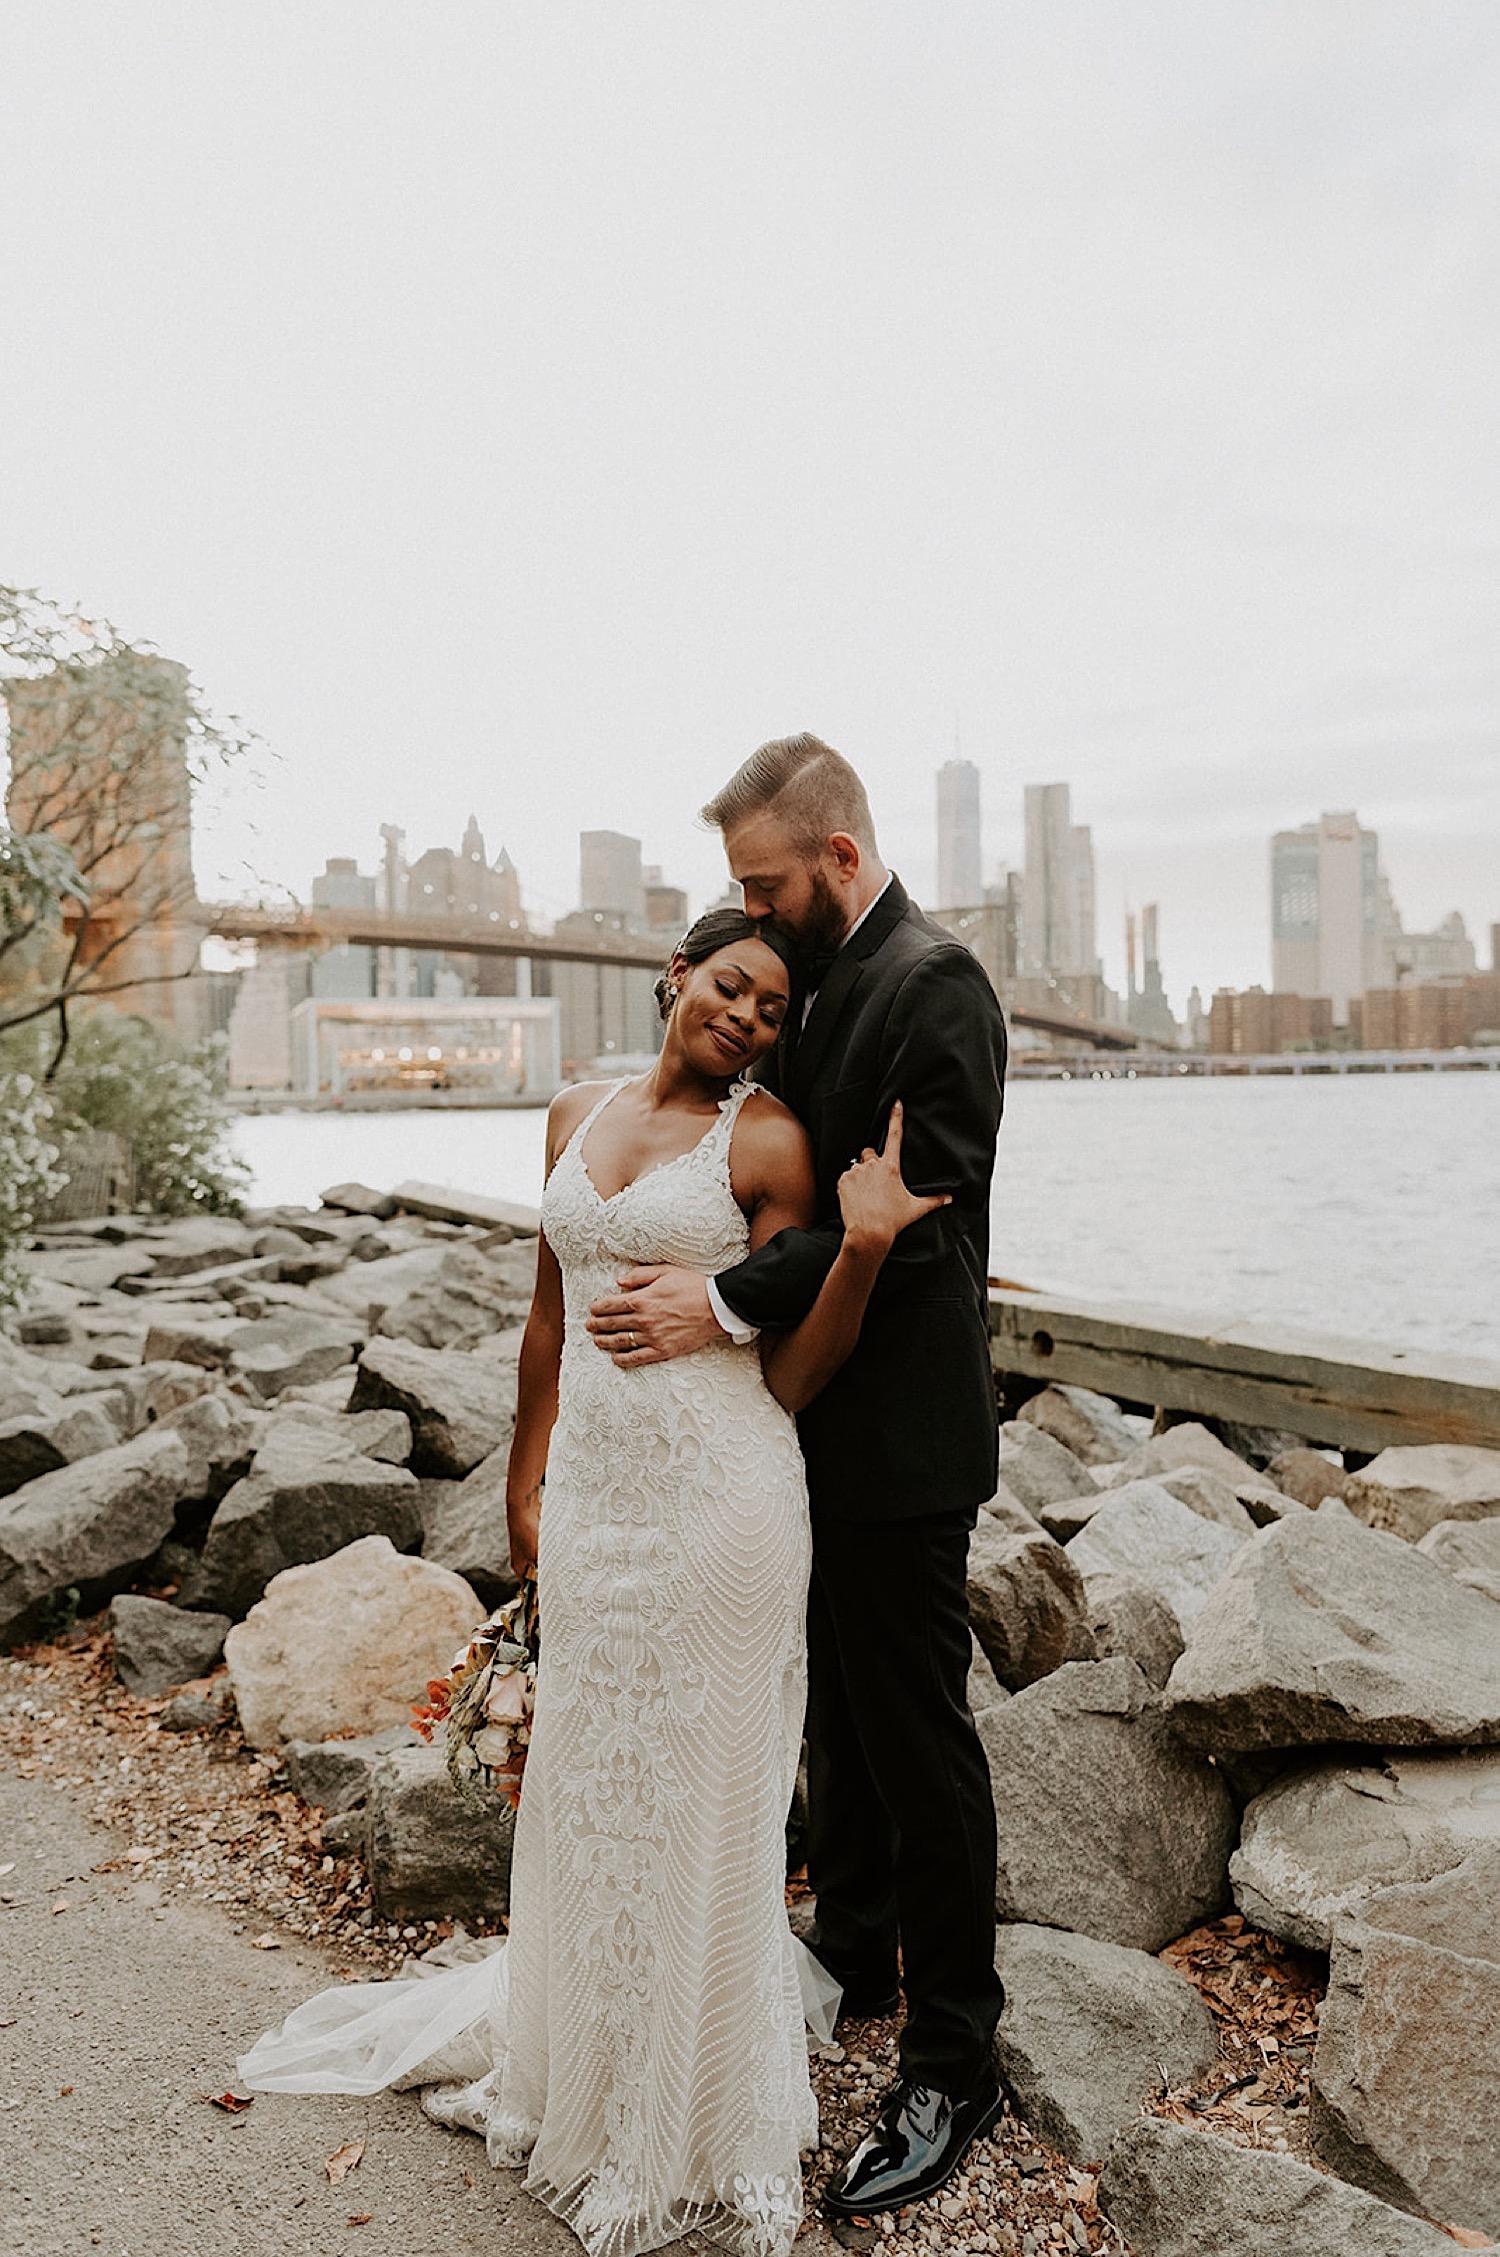 024 Brooklyn Dumbo Elopement Brooklyn Wedding Photographer NYC Wedding Destination Elopement